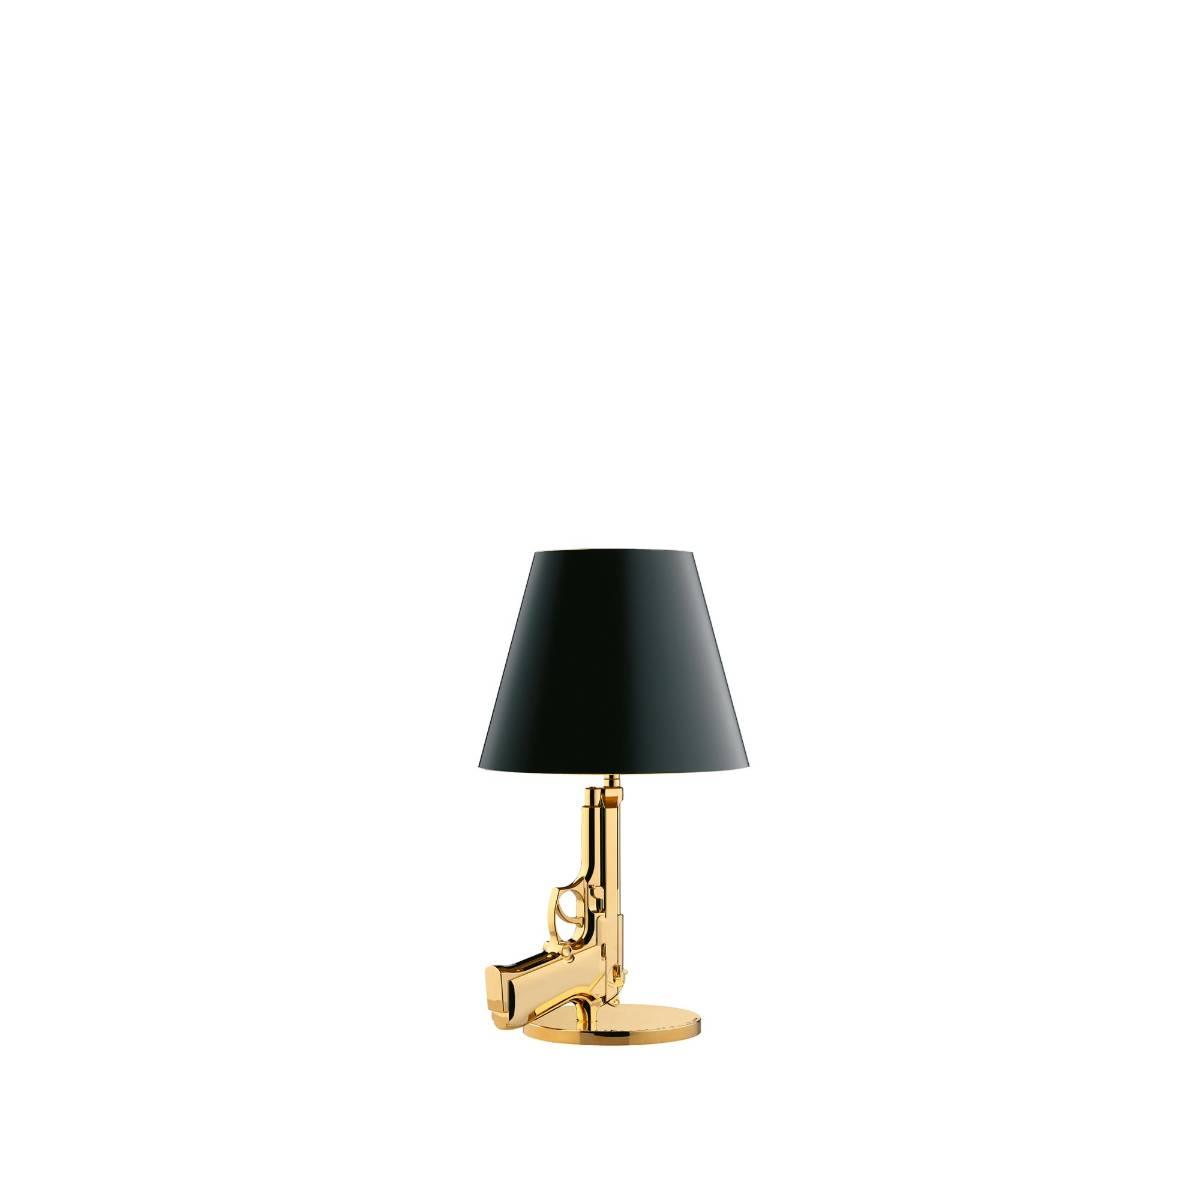 Flos Guns – Bedside Gun Tafellamp